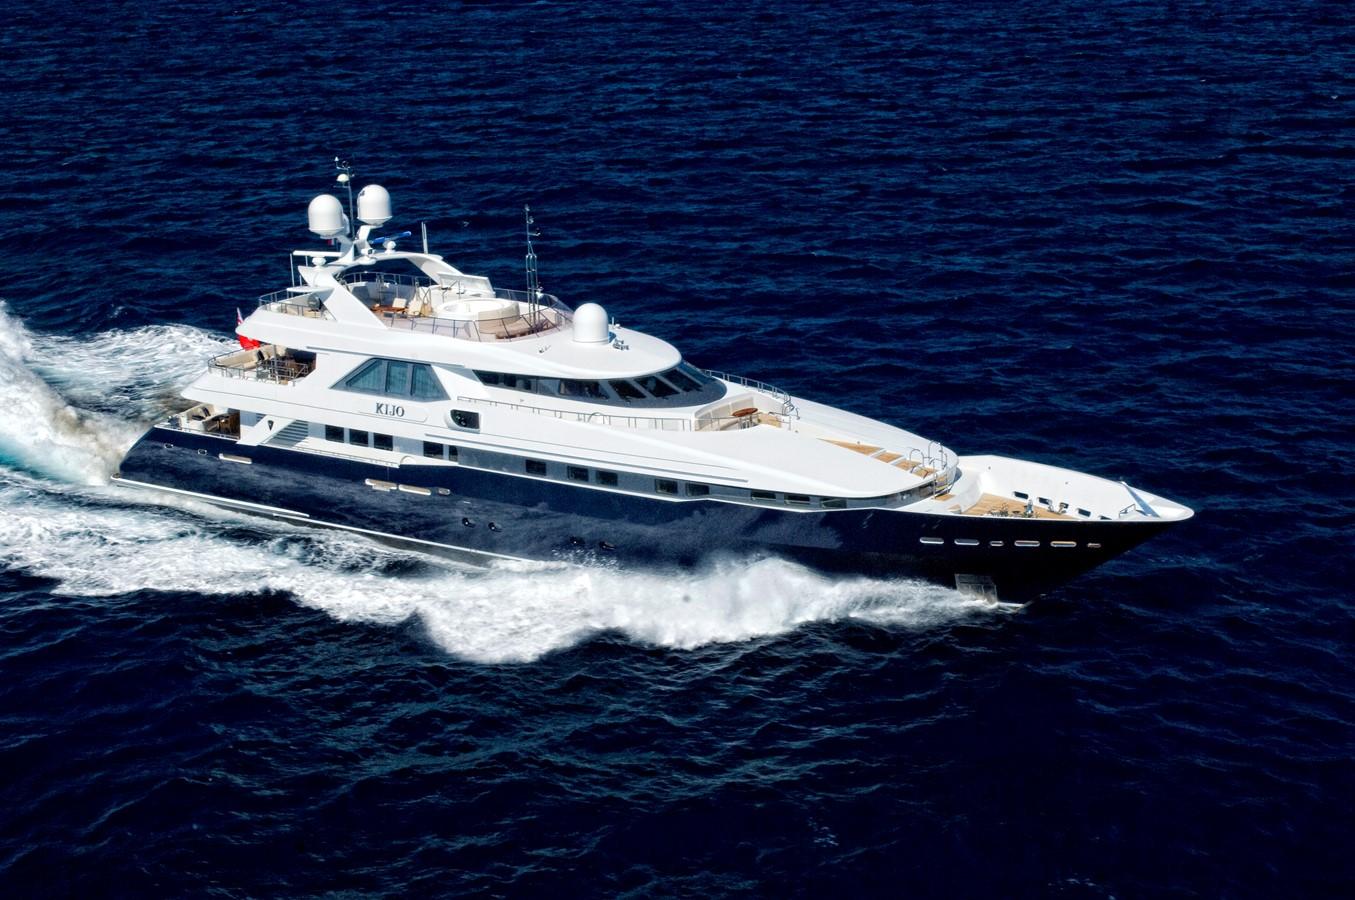 Motor Yacht KIJO for Sale with SuperYachtsMonaco